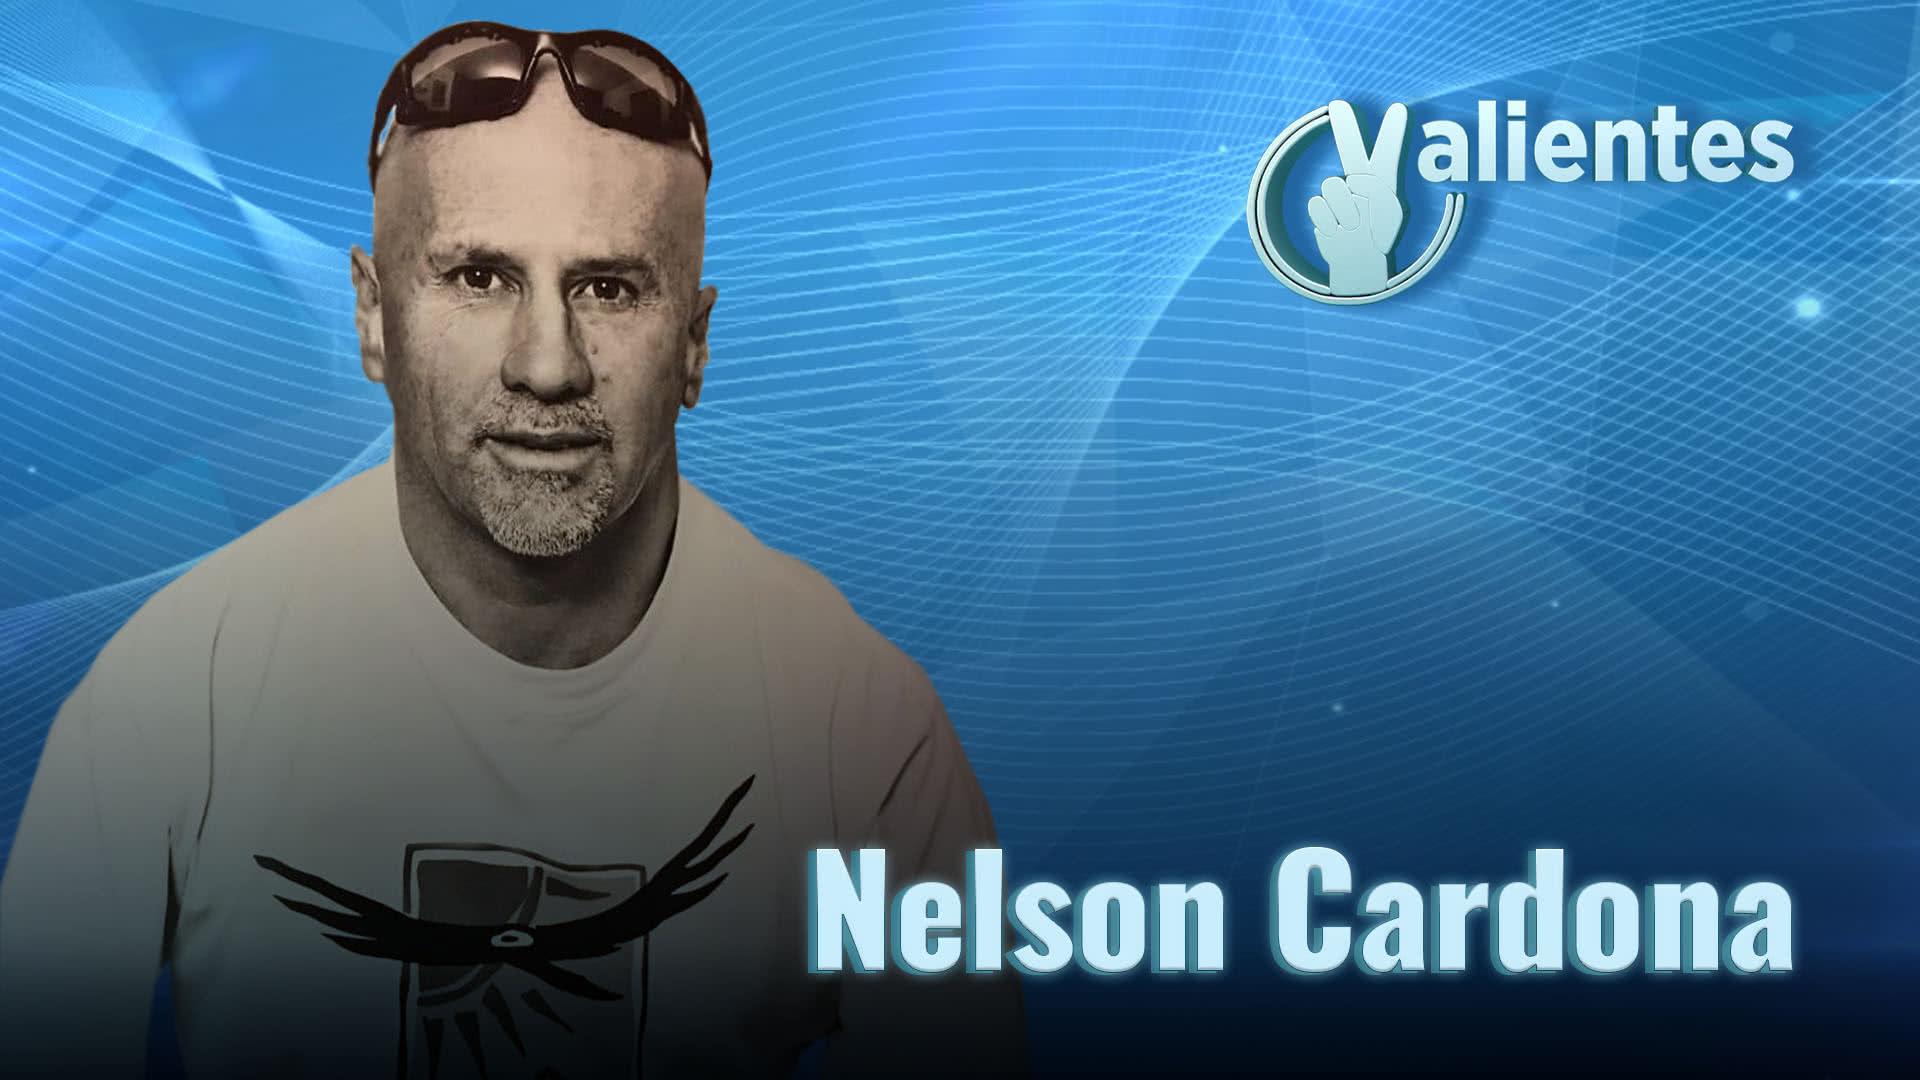 Nelson, un escalador sin límites que conquistó la cima del Everest